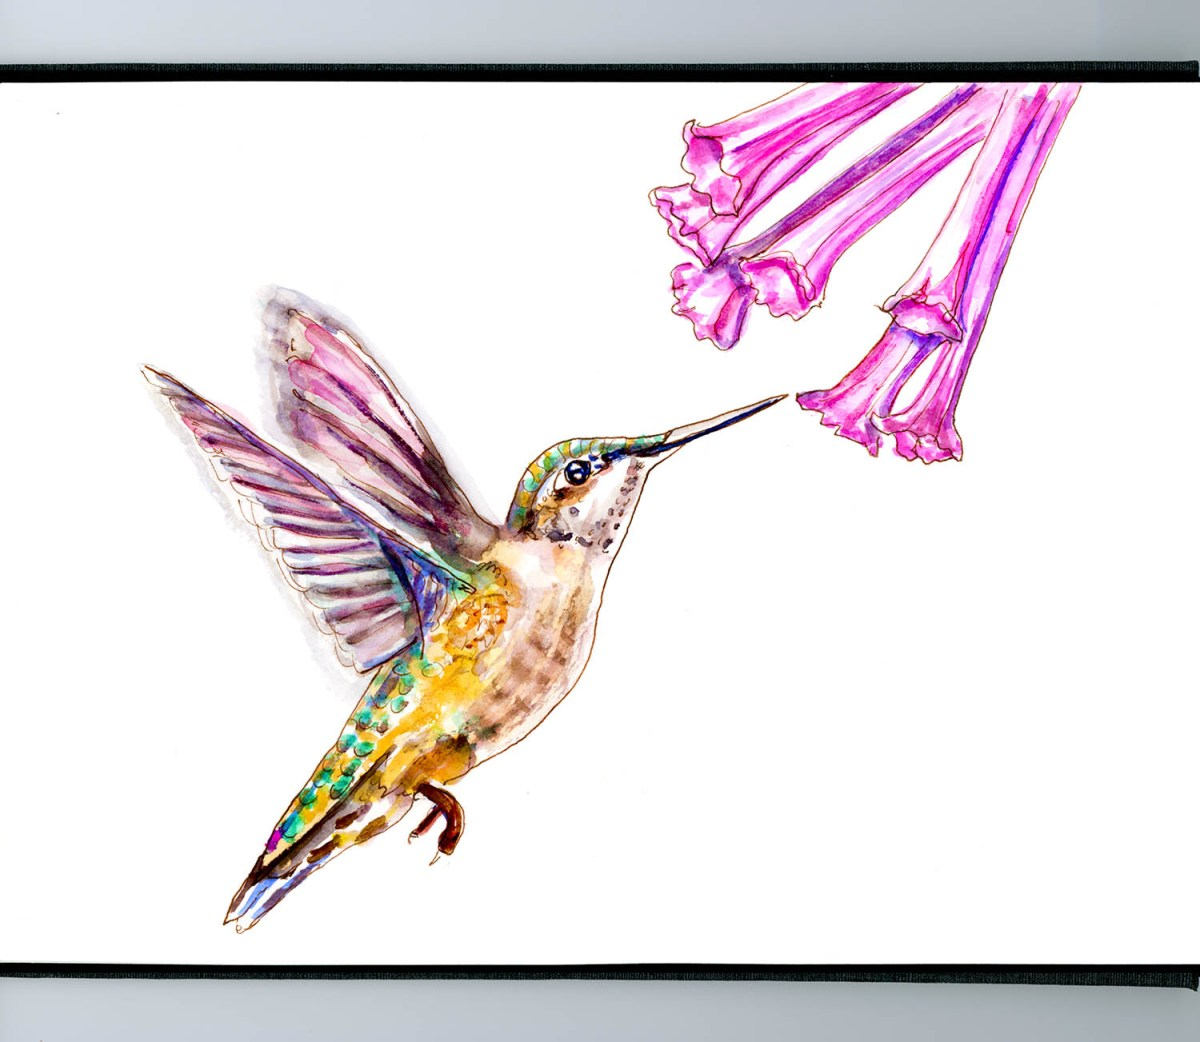 #WorldWatercolorGroup - Day 6 - Like A Hummingbird - Doodlewash